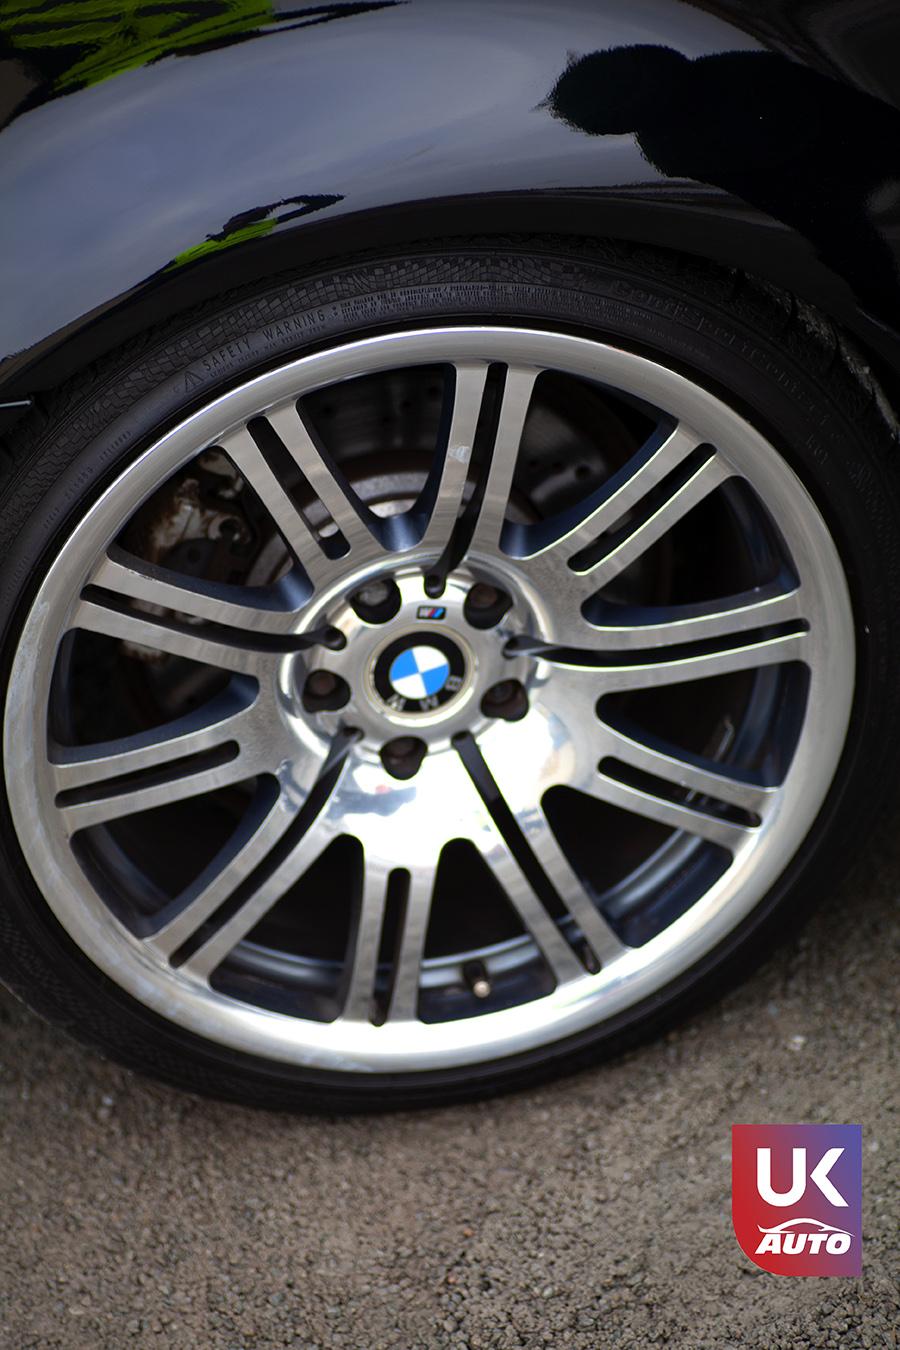 IMG 3069 - Import BMW M3 E46 CABRIOLET UK RHD NOTRE CLIENT UKAUTO.fr Félicitation à Cedric